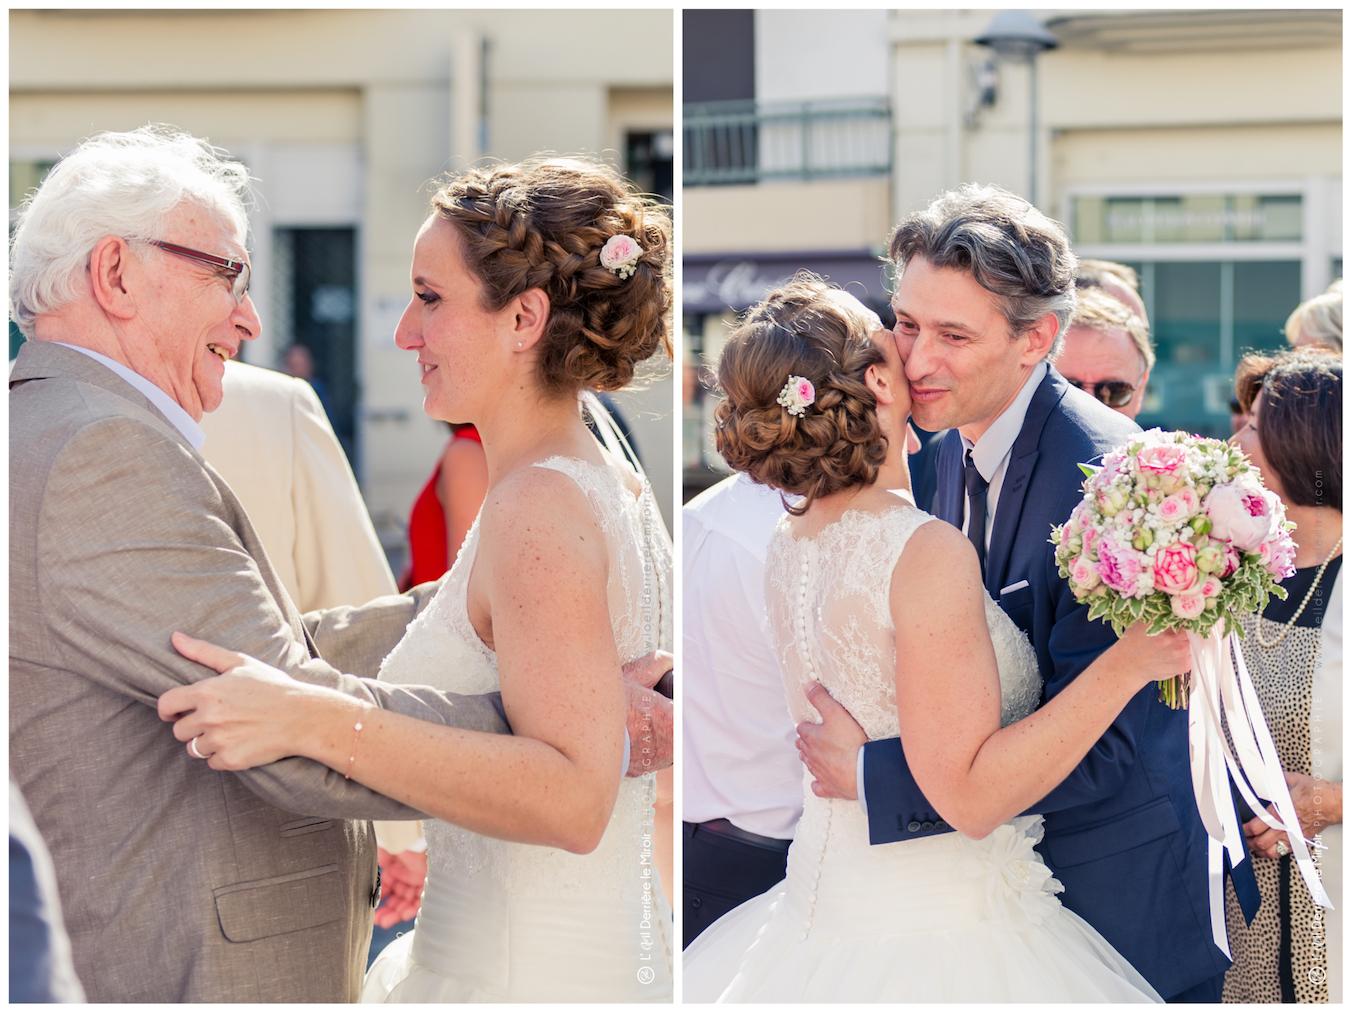 photographe-mariage-06-chateau-vaugrenier-13